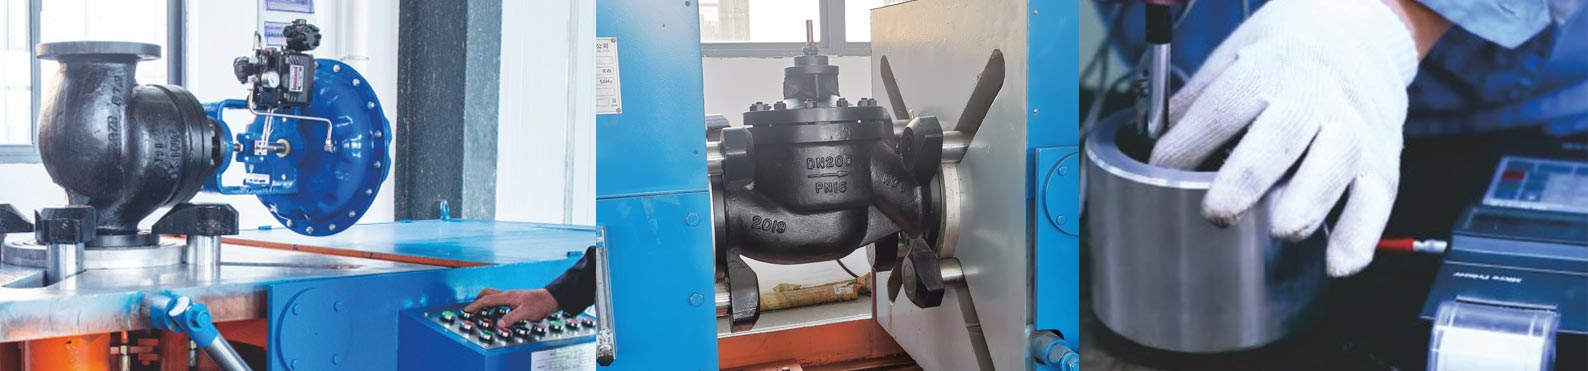 pneumatic control-valve-test